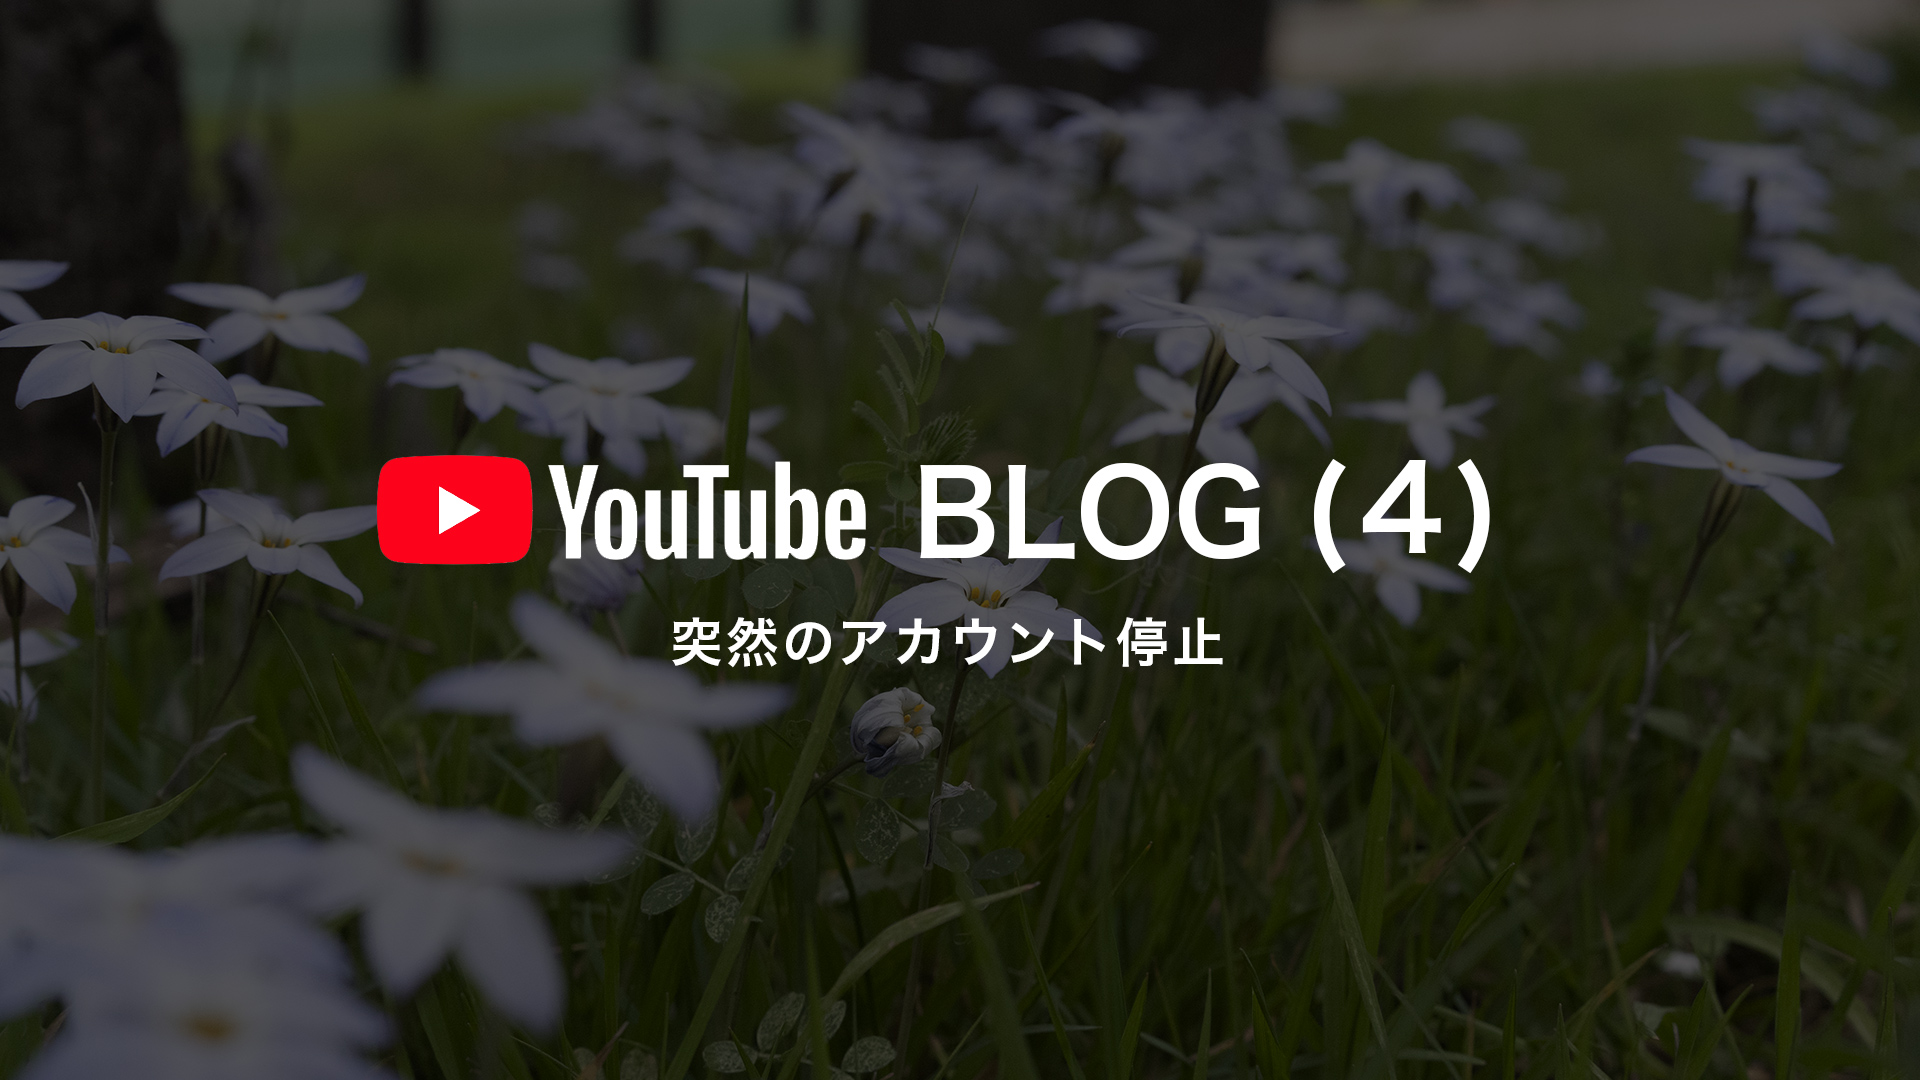 YouTubeアカウント停止